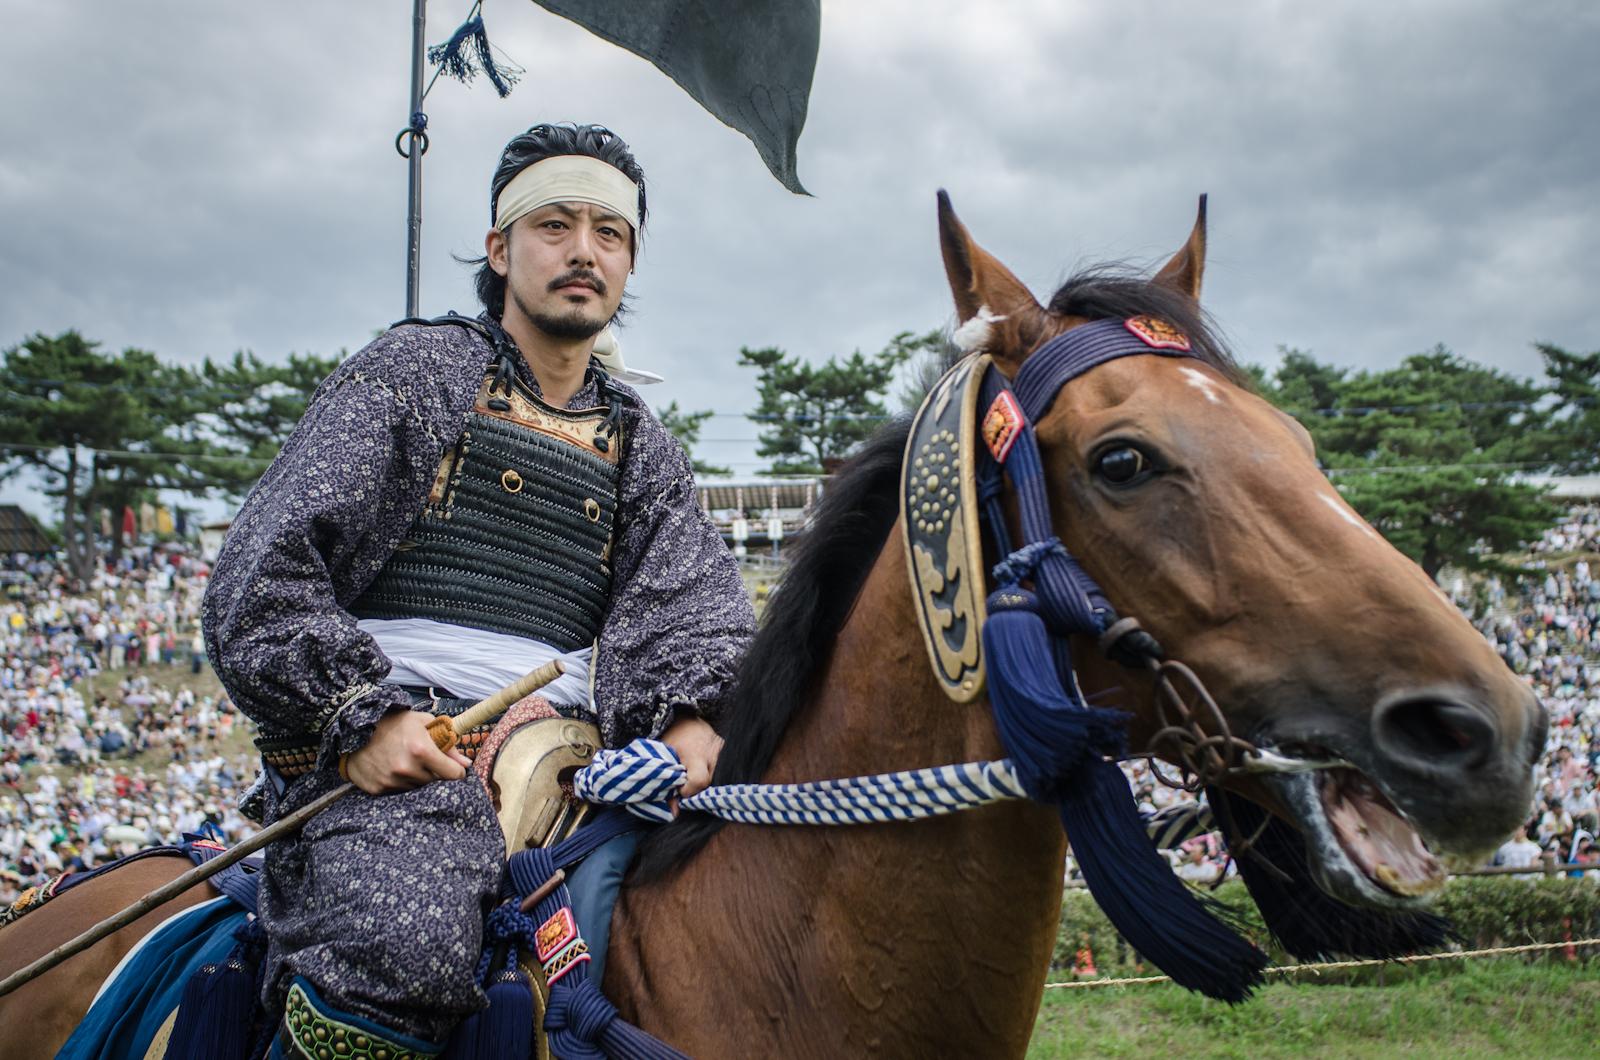 A Samurai warrior at the  Soma Nomaoi horse festival held near the Fukushima Exclusion Zone in Japan